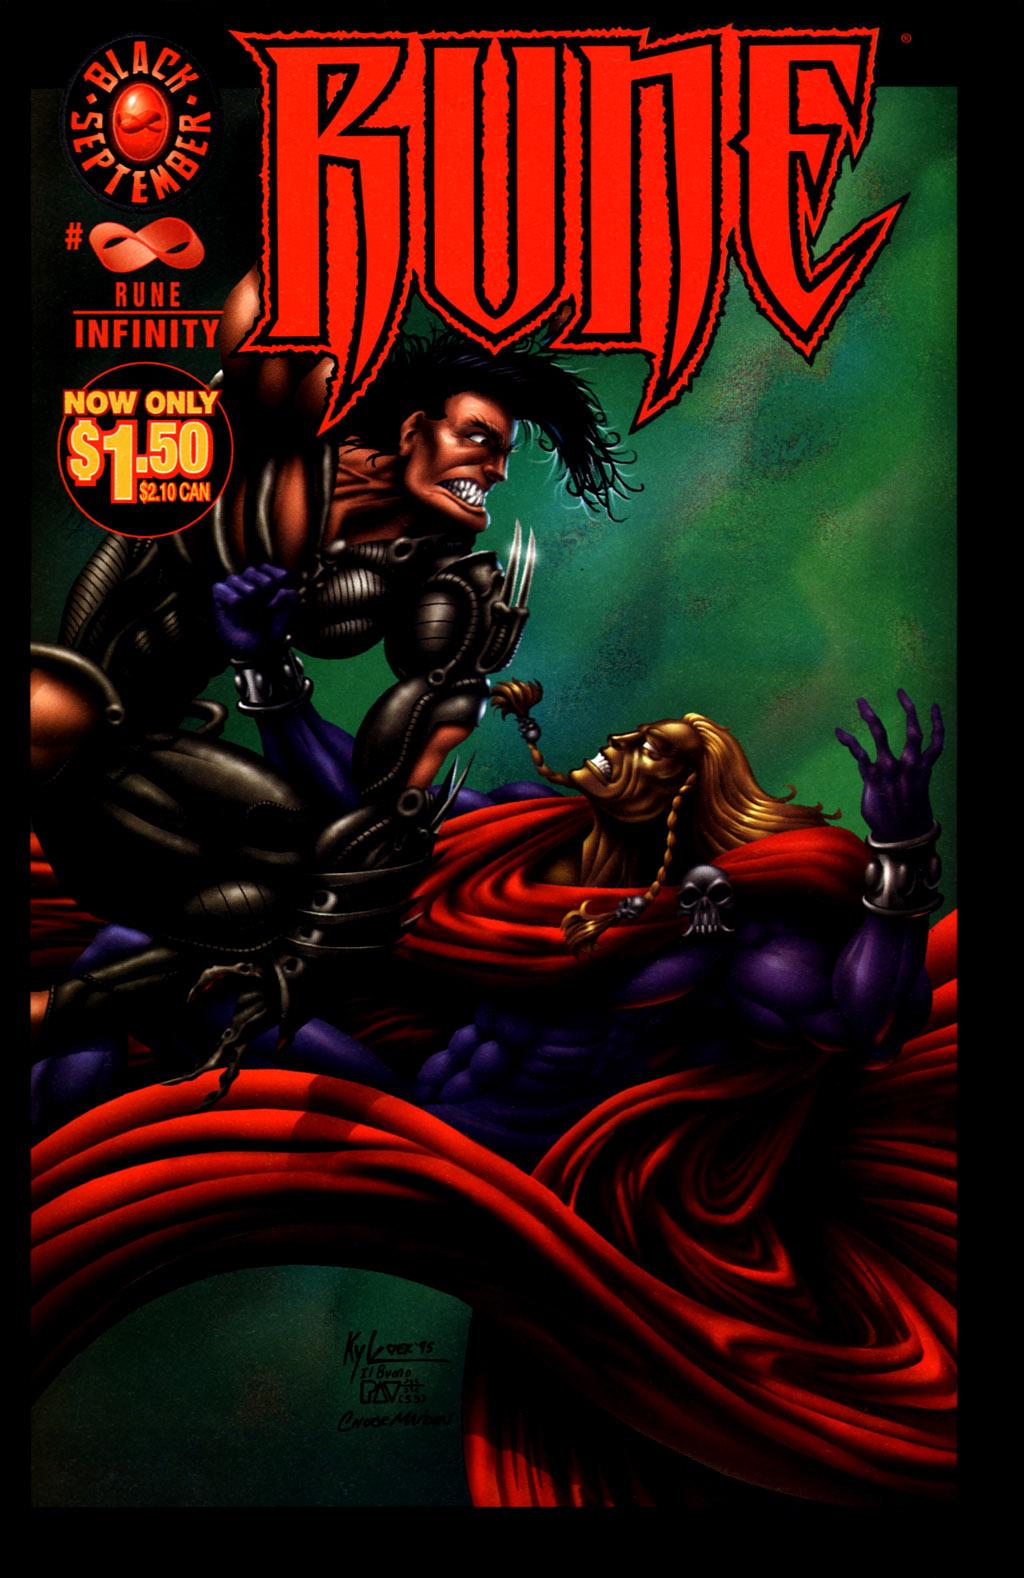 Read online Rune (1995) comic -  Issue # _Infinity - 2